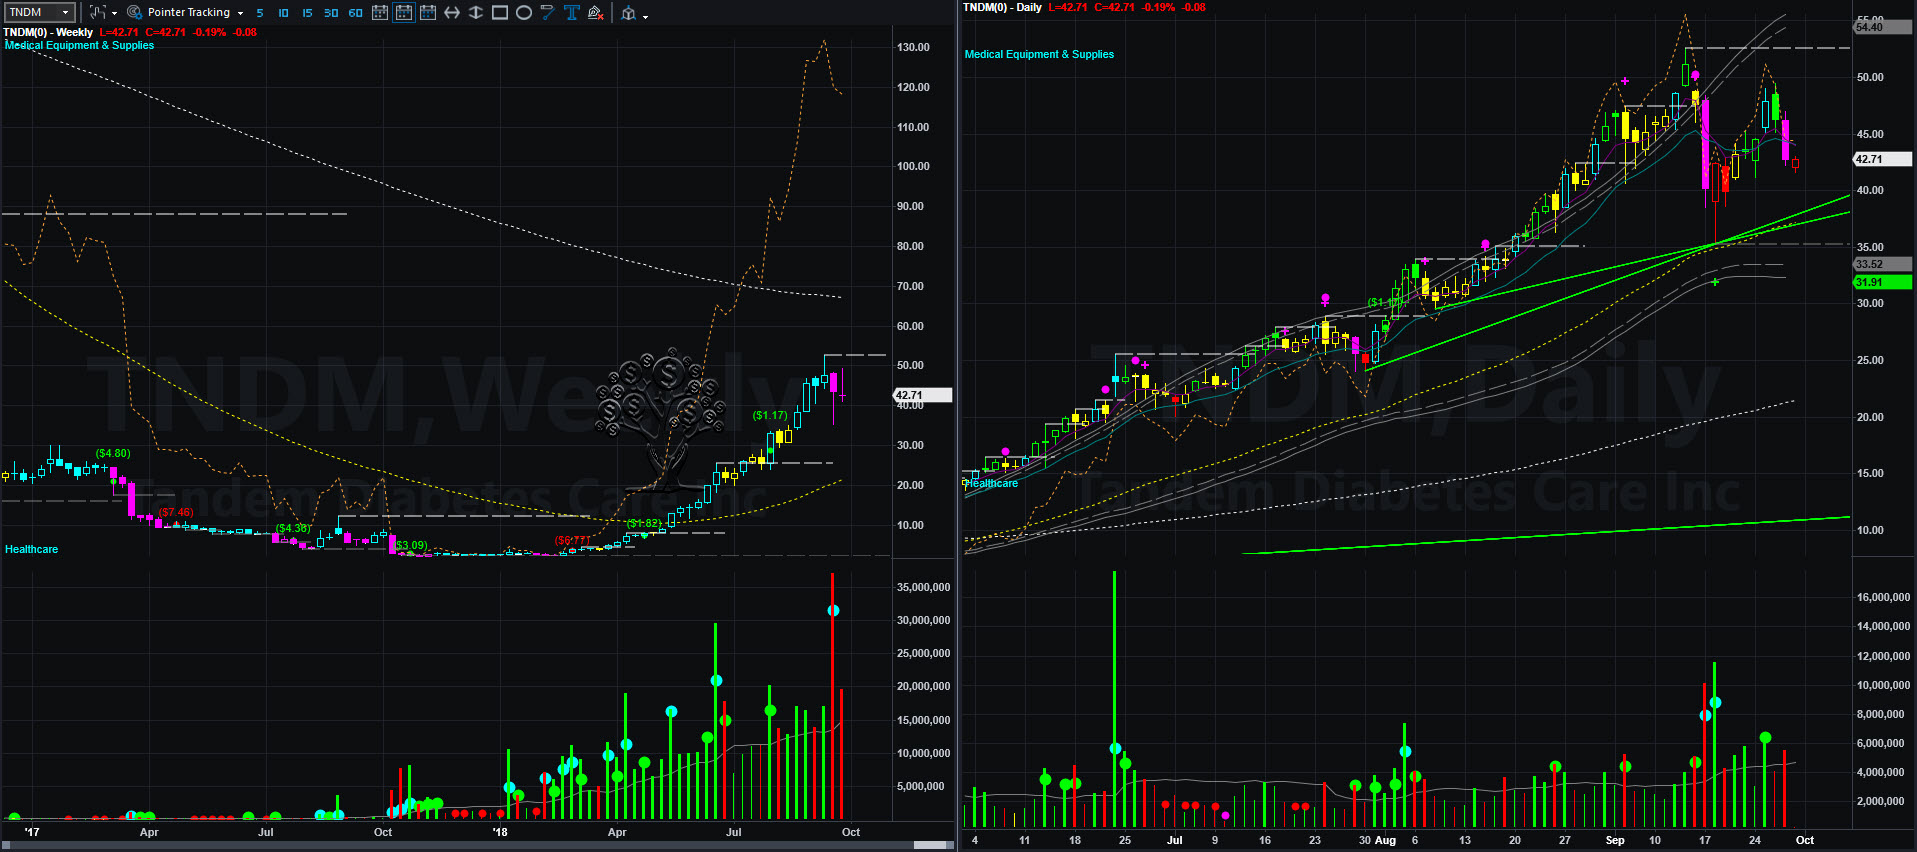 tndm chart 2018-09-28_9-42-11.jpg